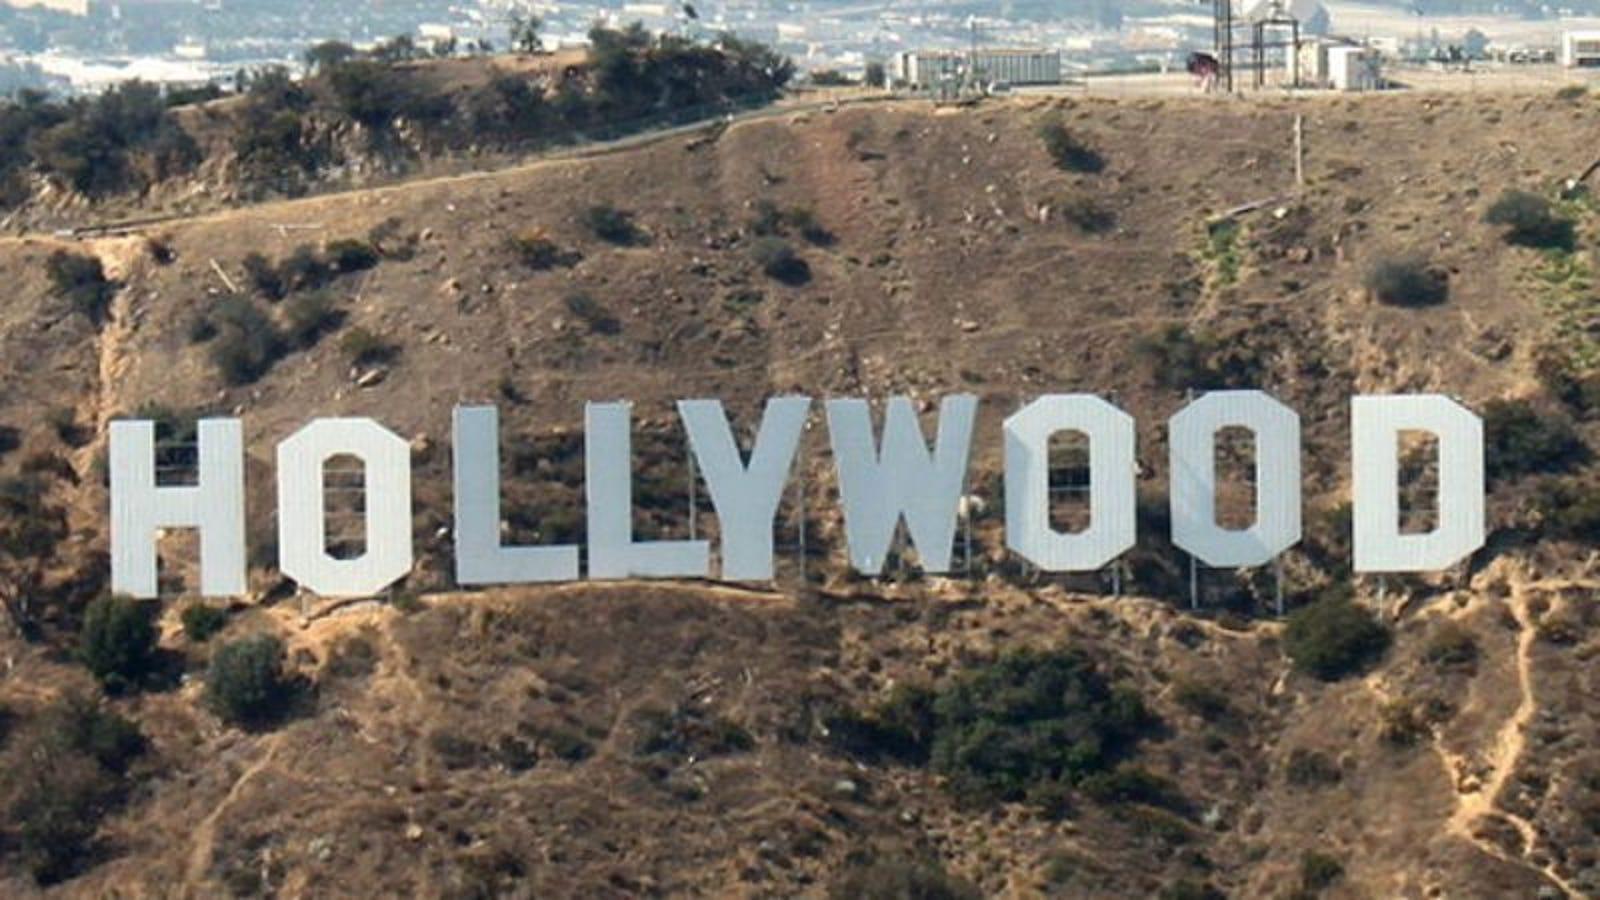 Landmark Win LA Is Finally Restoring The Hollywood Sign To Its Original Sentence